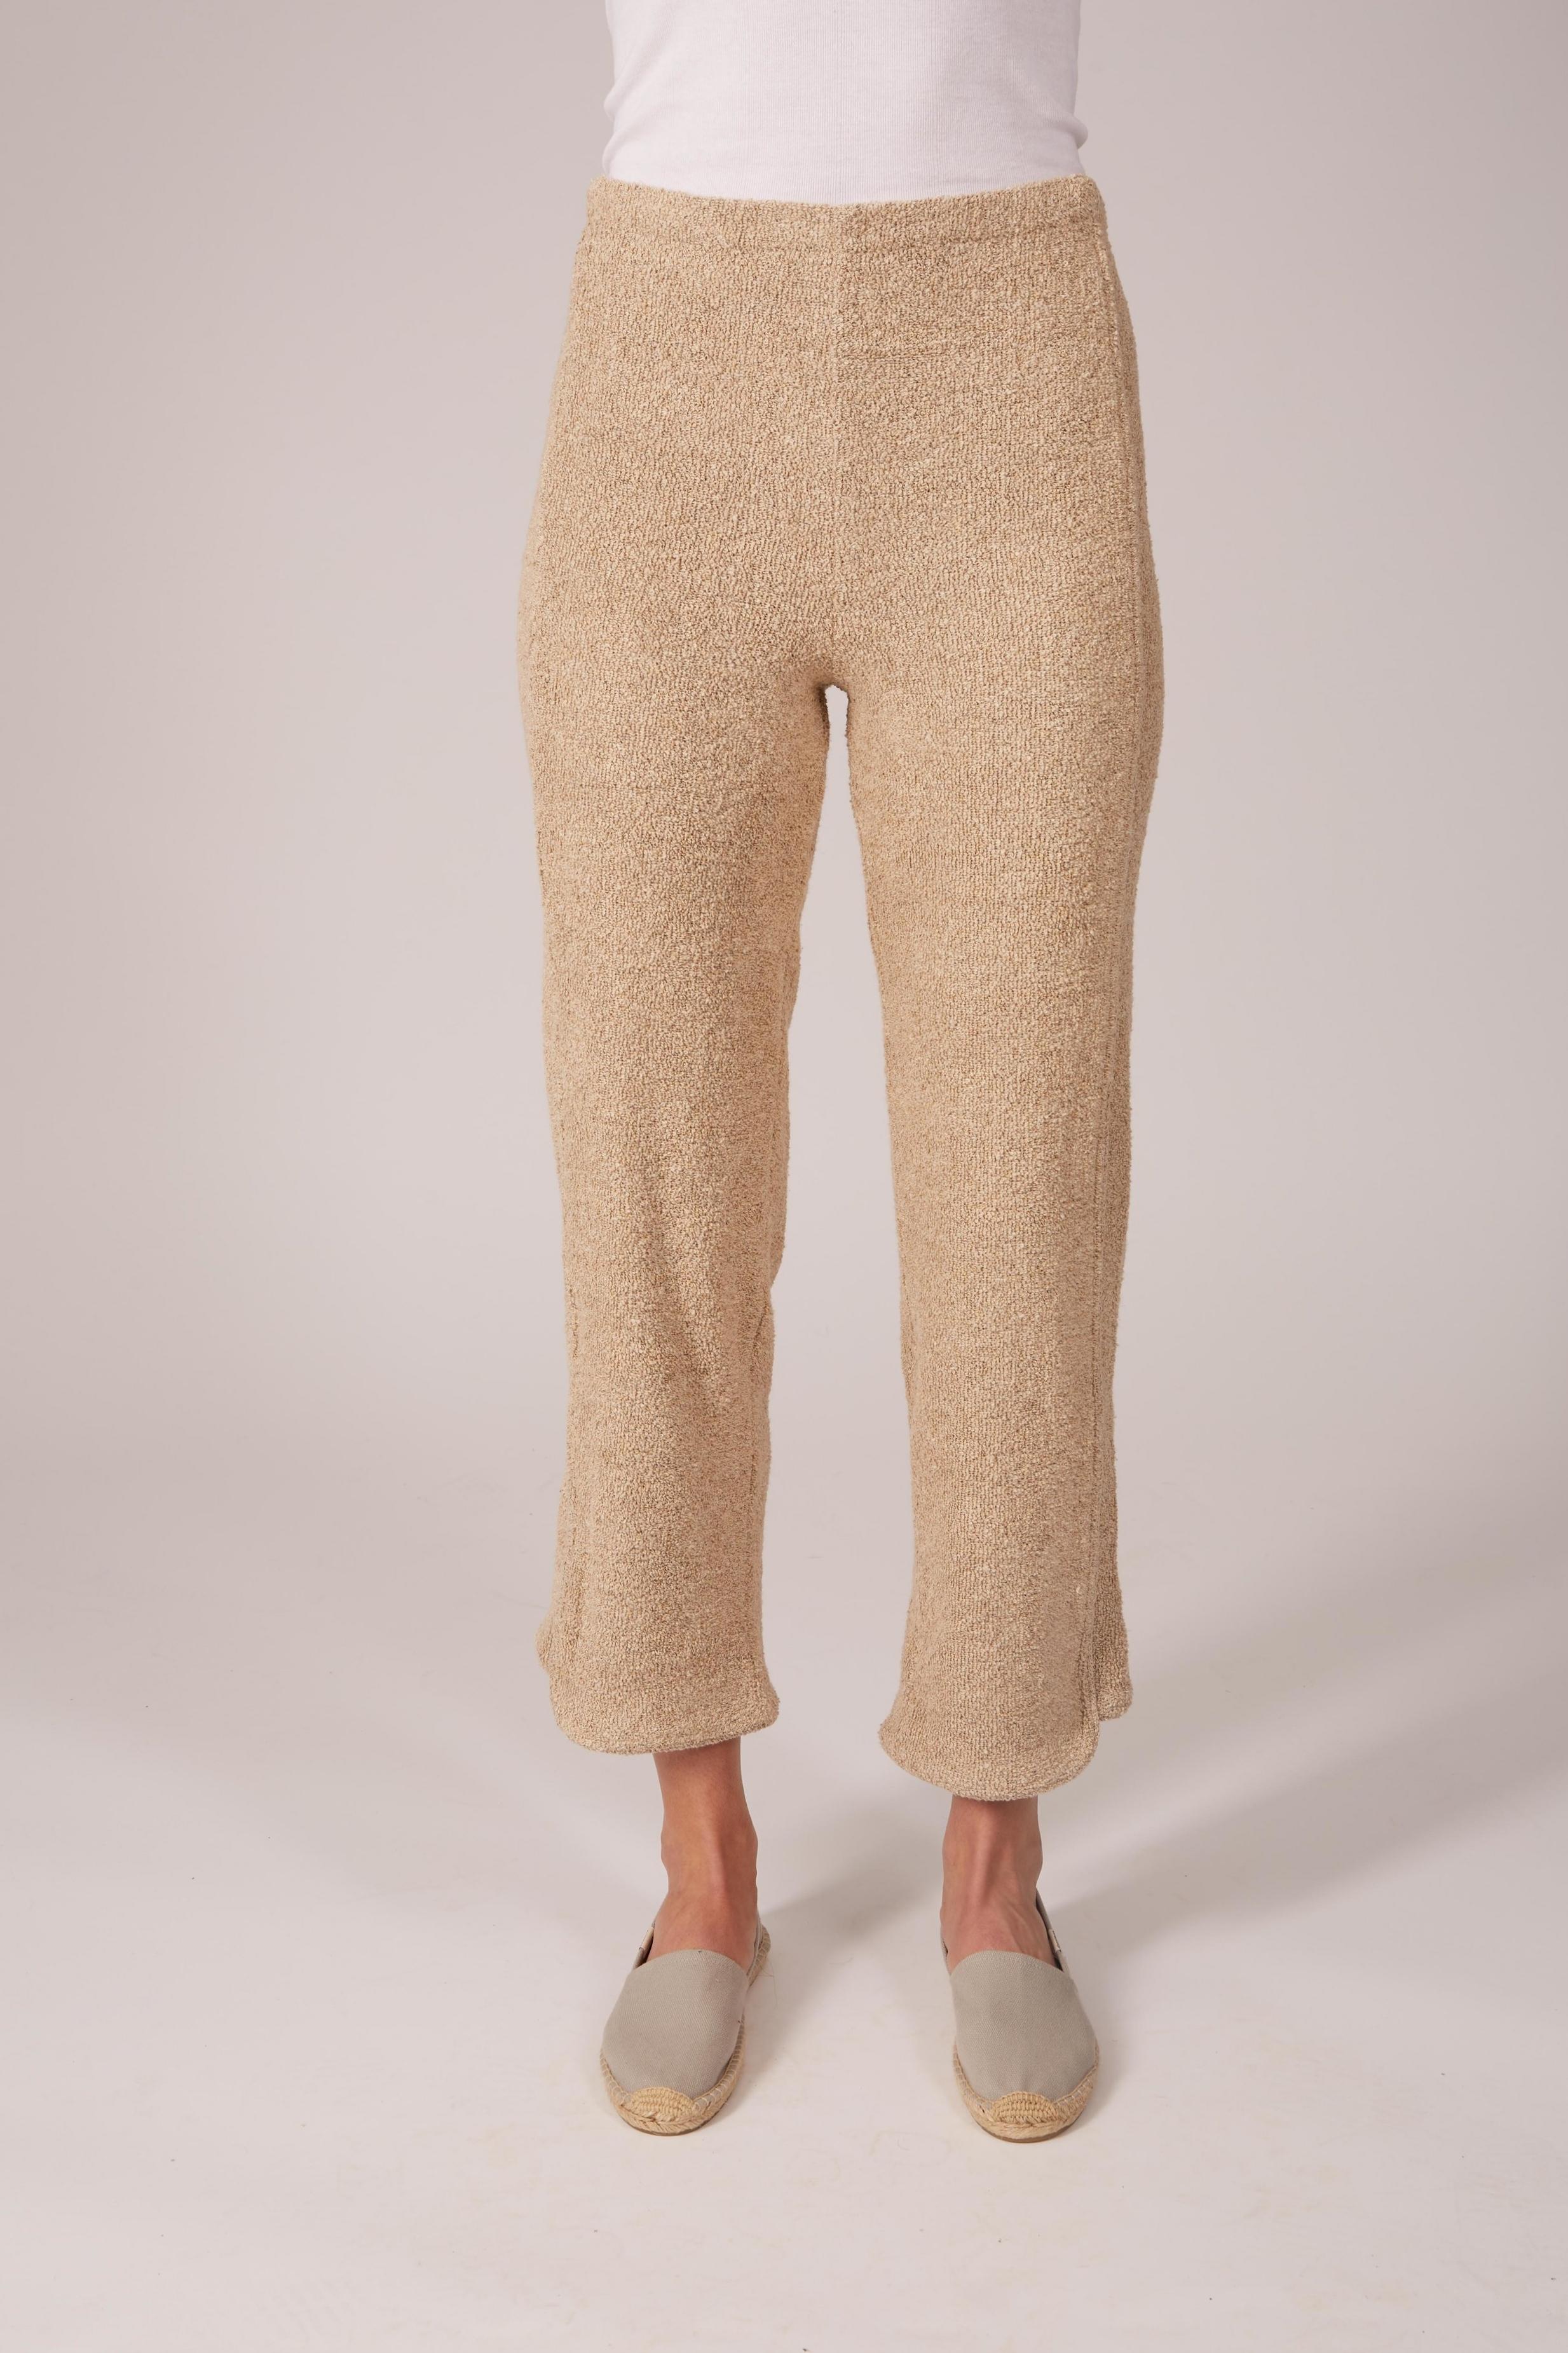 DECK PANTS $175 -